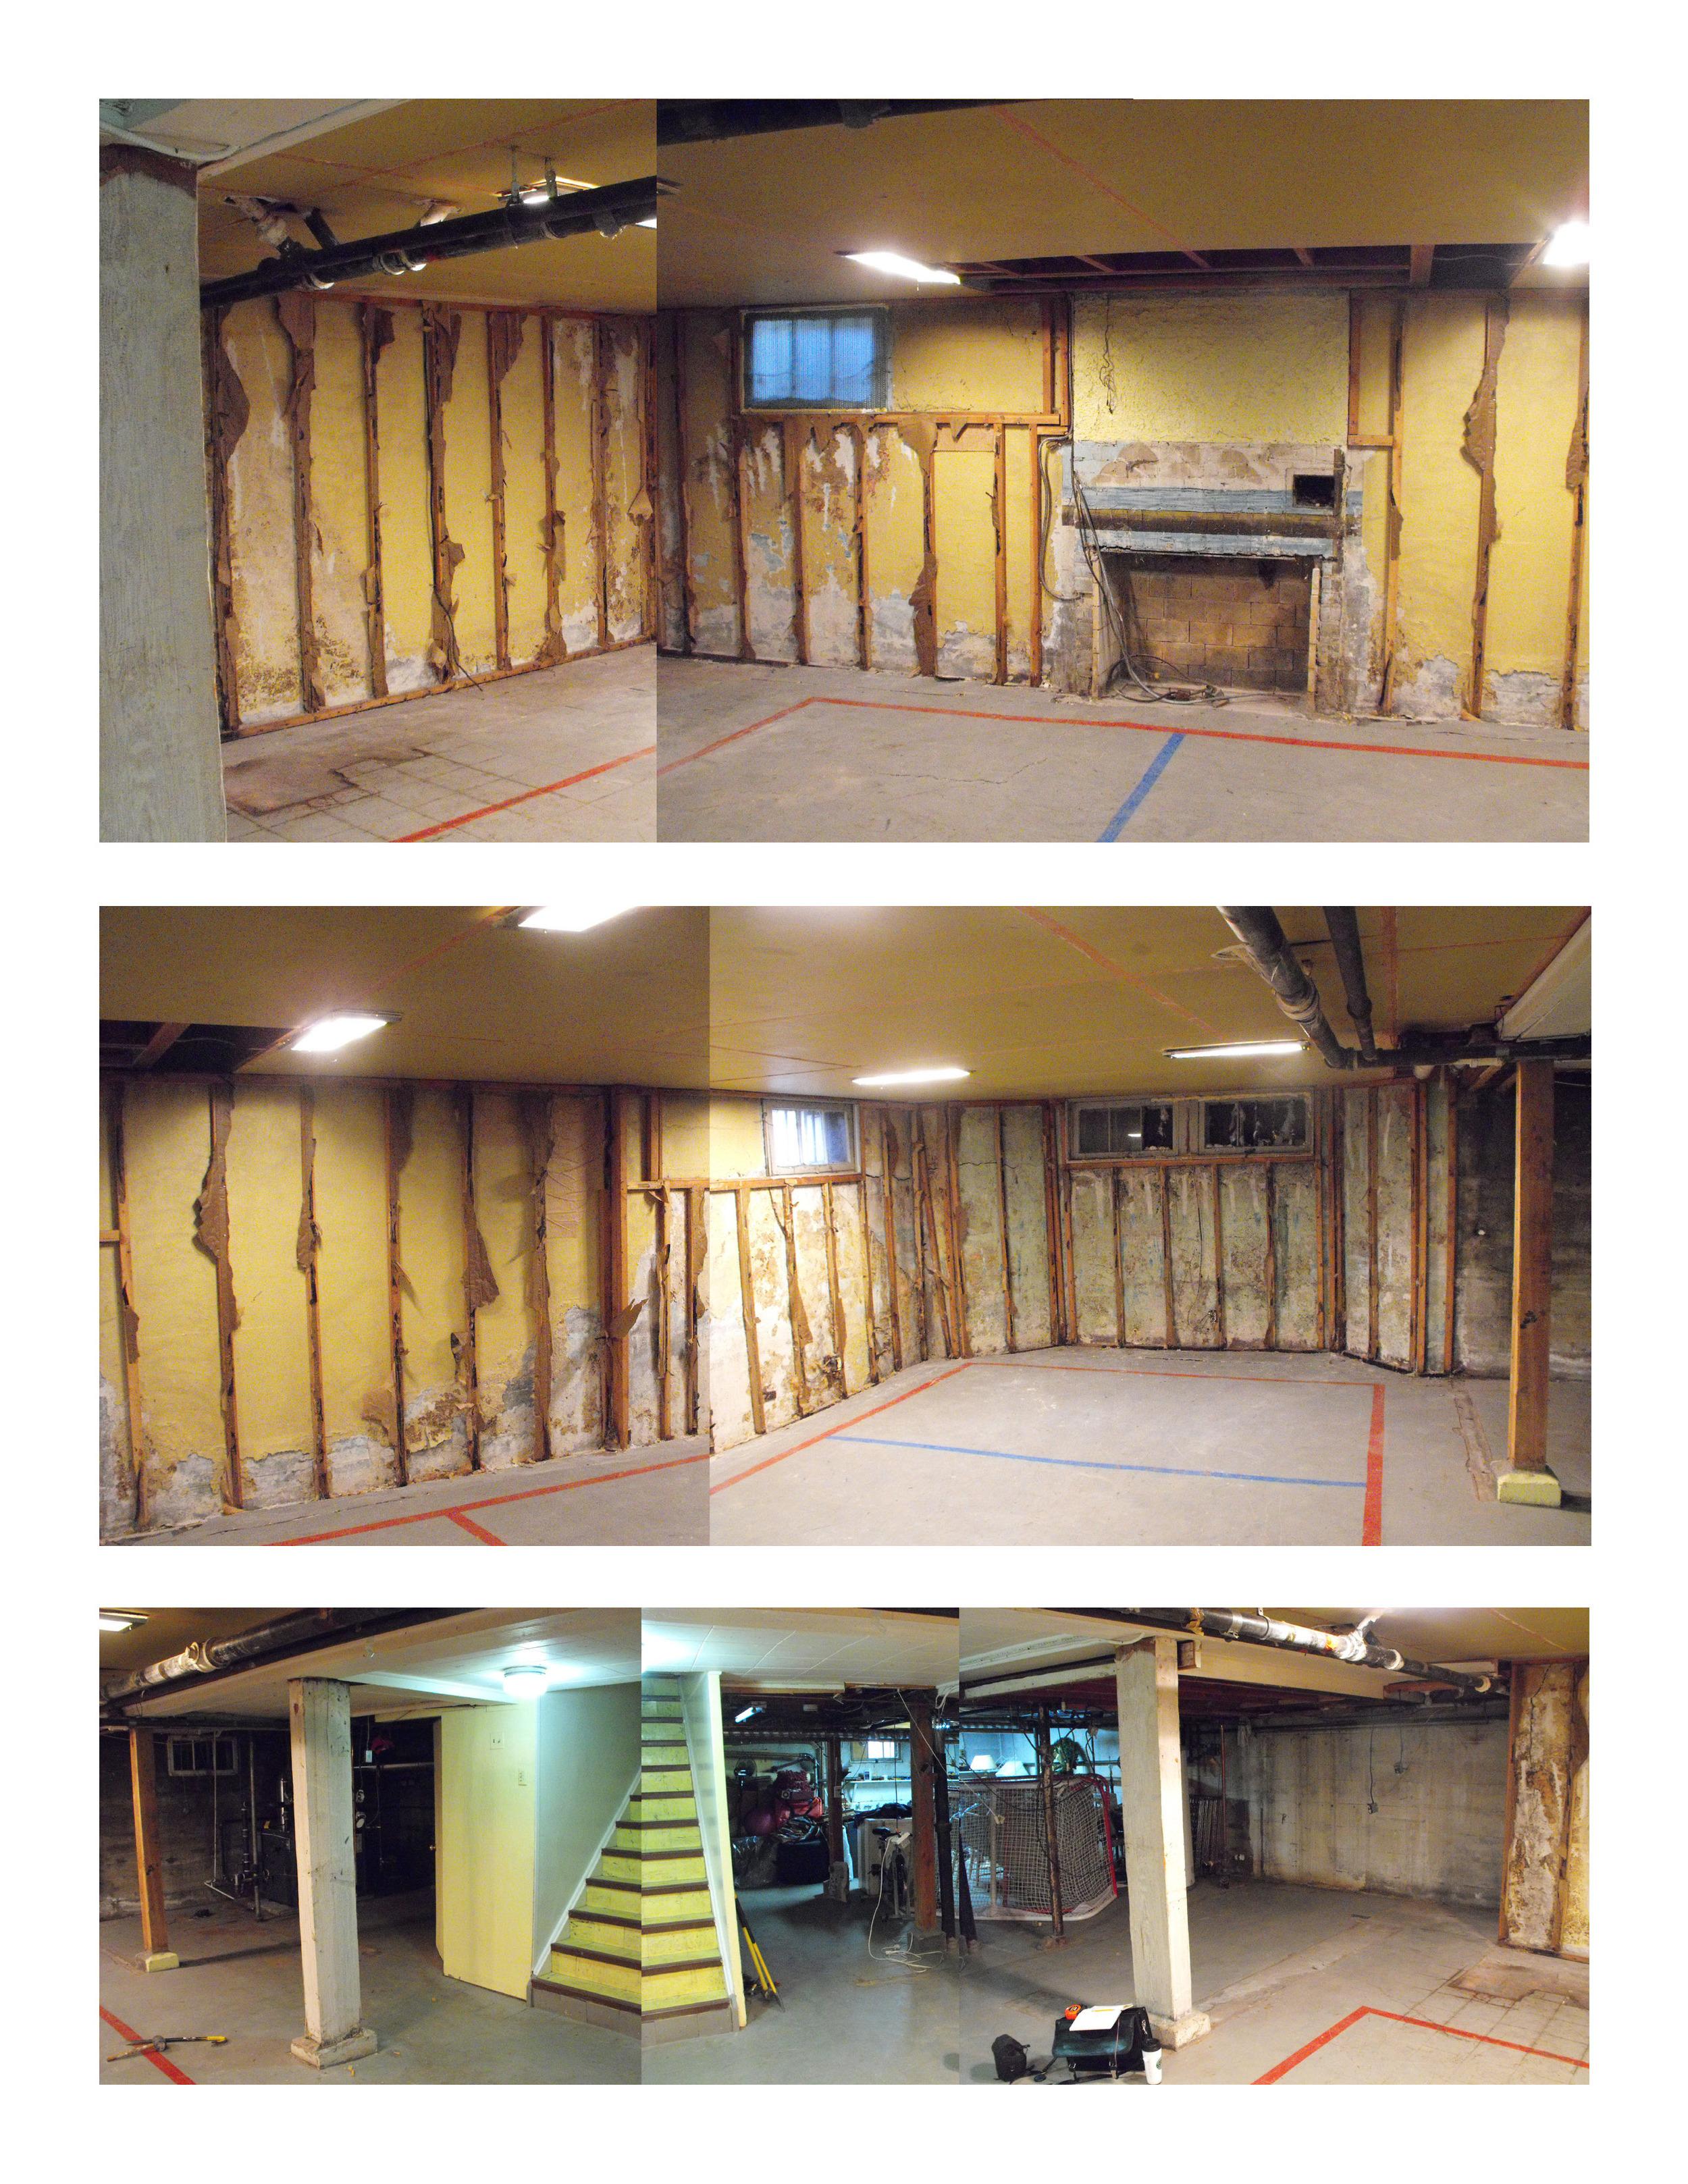 Unfinished basement